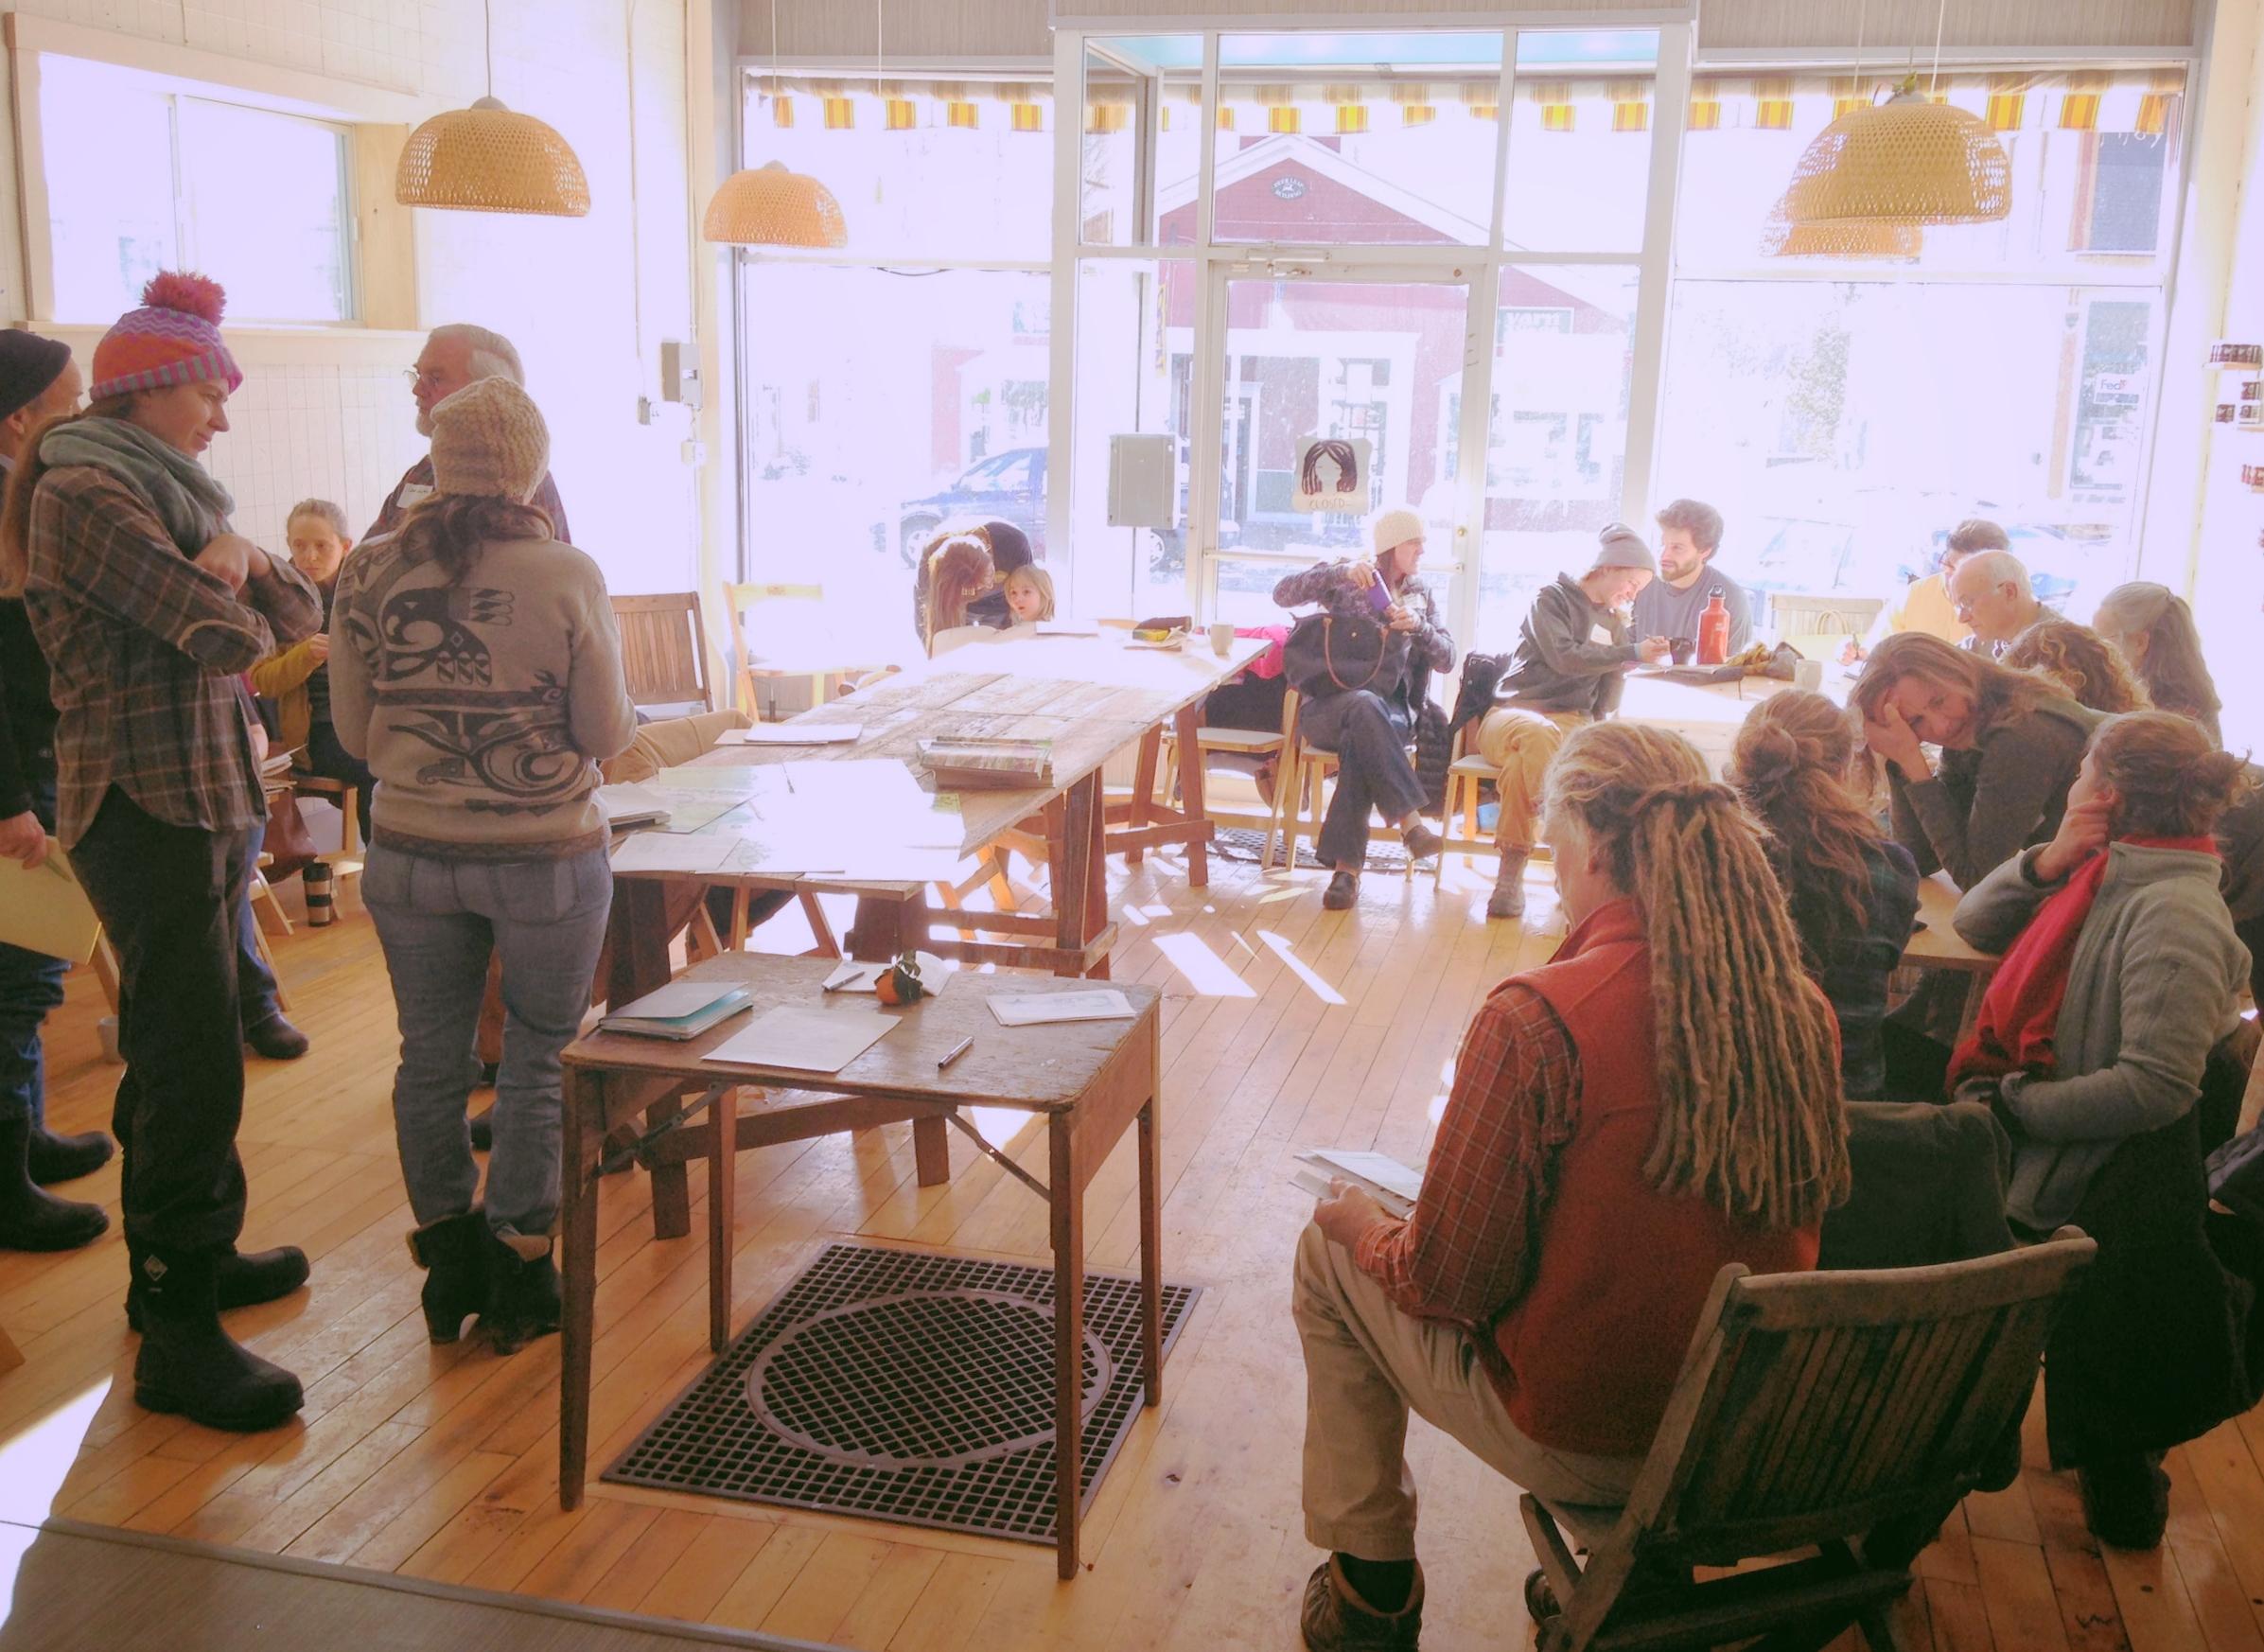 ACORN Growers meeting, tandem, bristol, january 2016